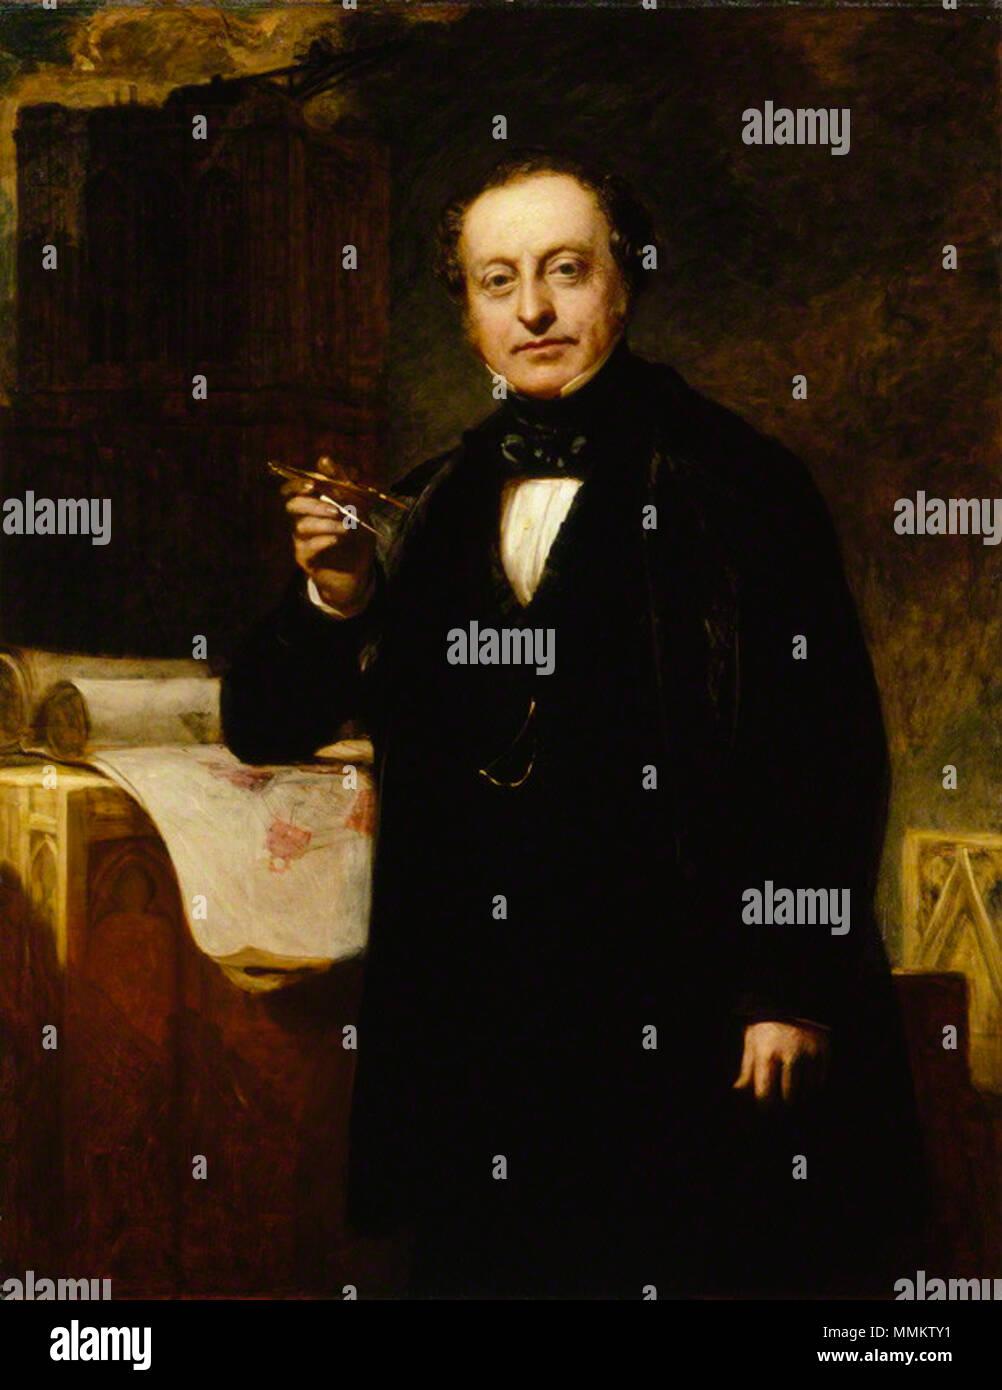 by John Prescott Knight, oil on canvas, circa 1851 Sir Charles Barry by John Prescott Knight - Stock Image